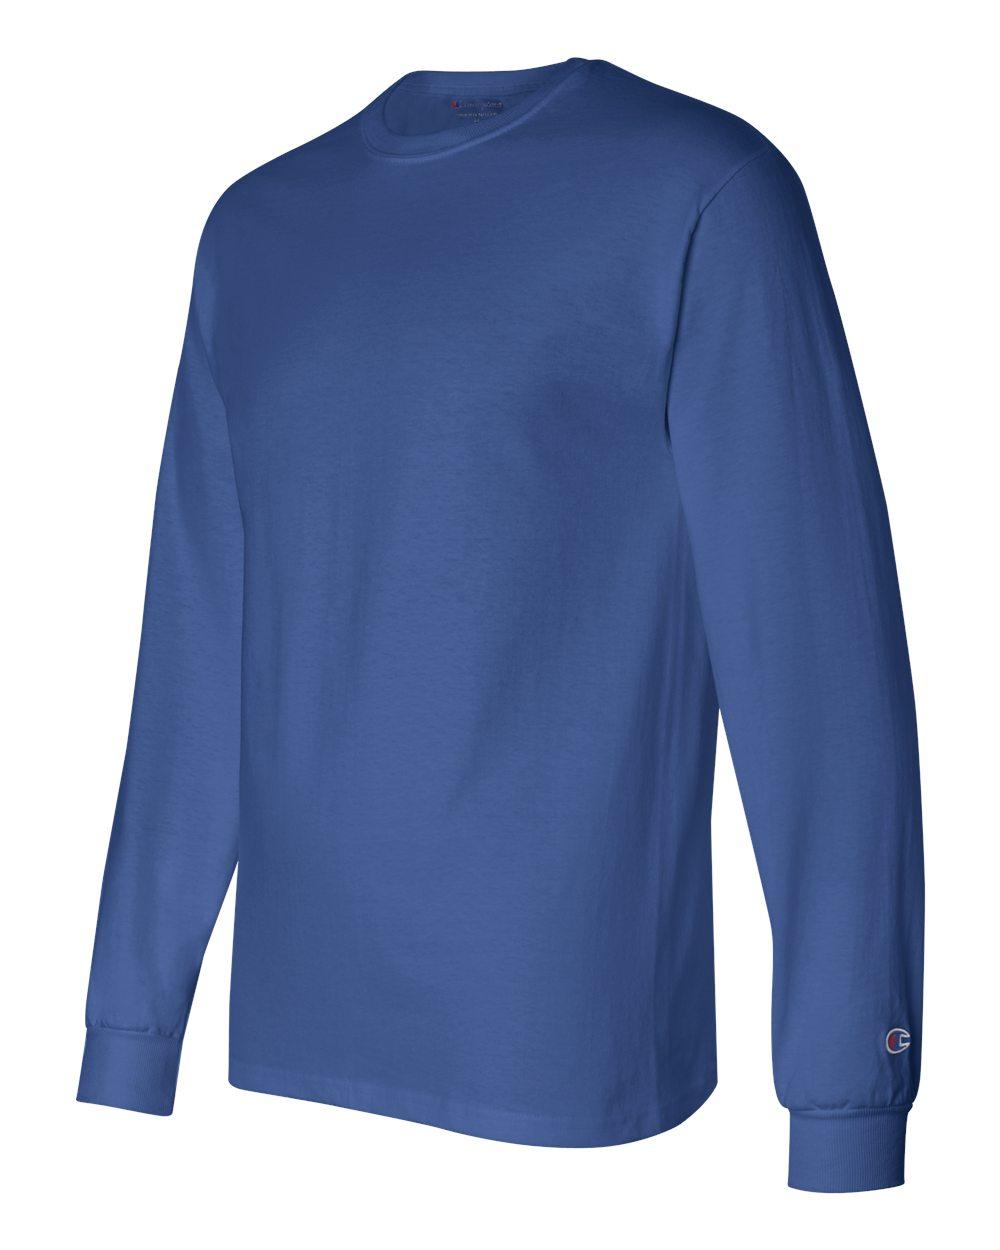 Champion Men/'s 5.2 oz Long-Sleeve T-Shirt CC8C S-2XL